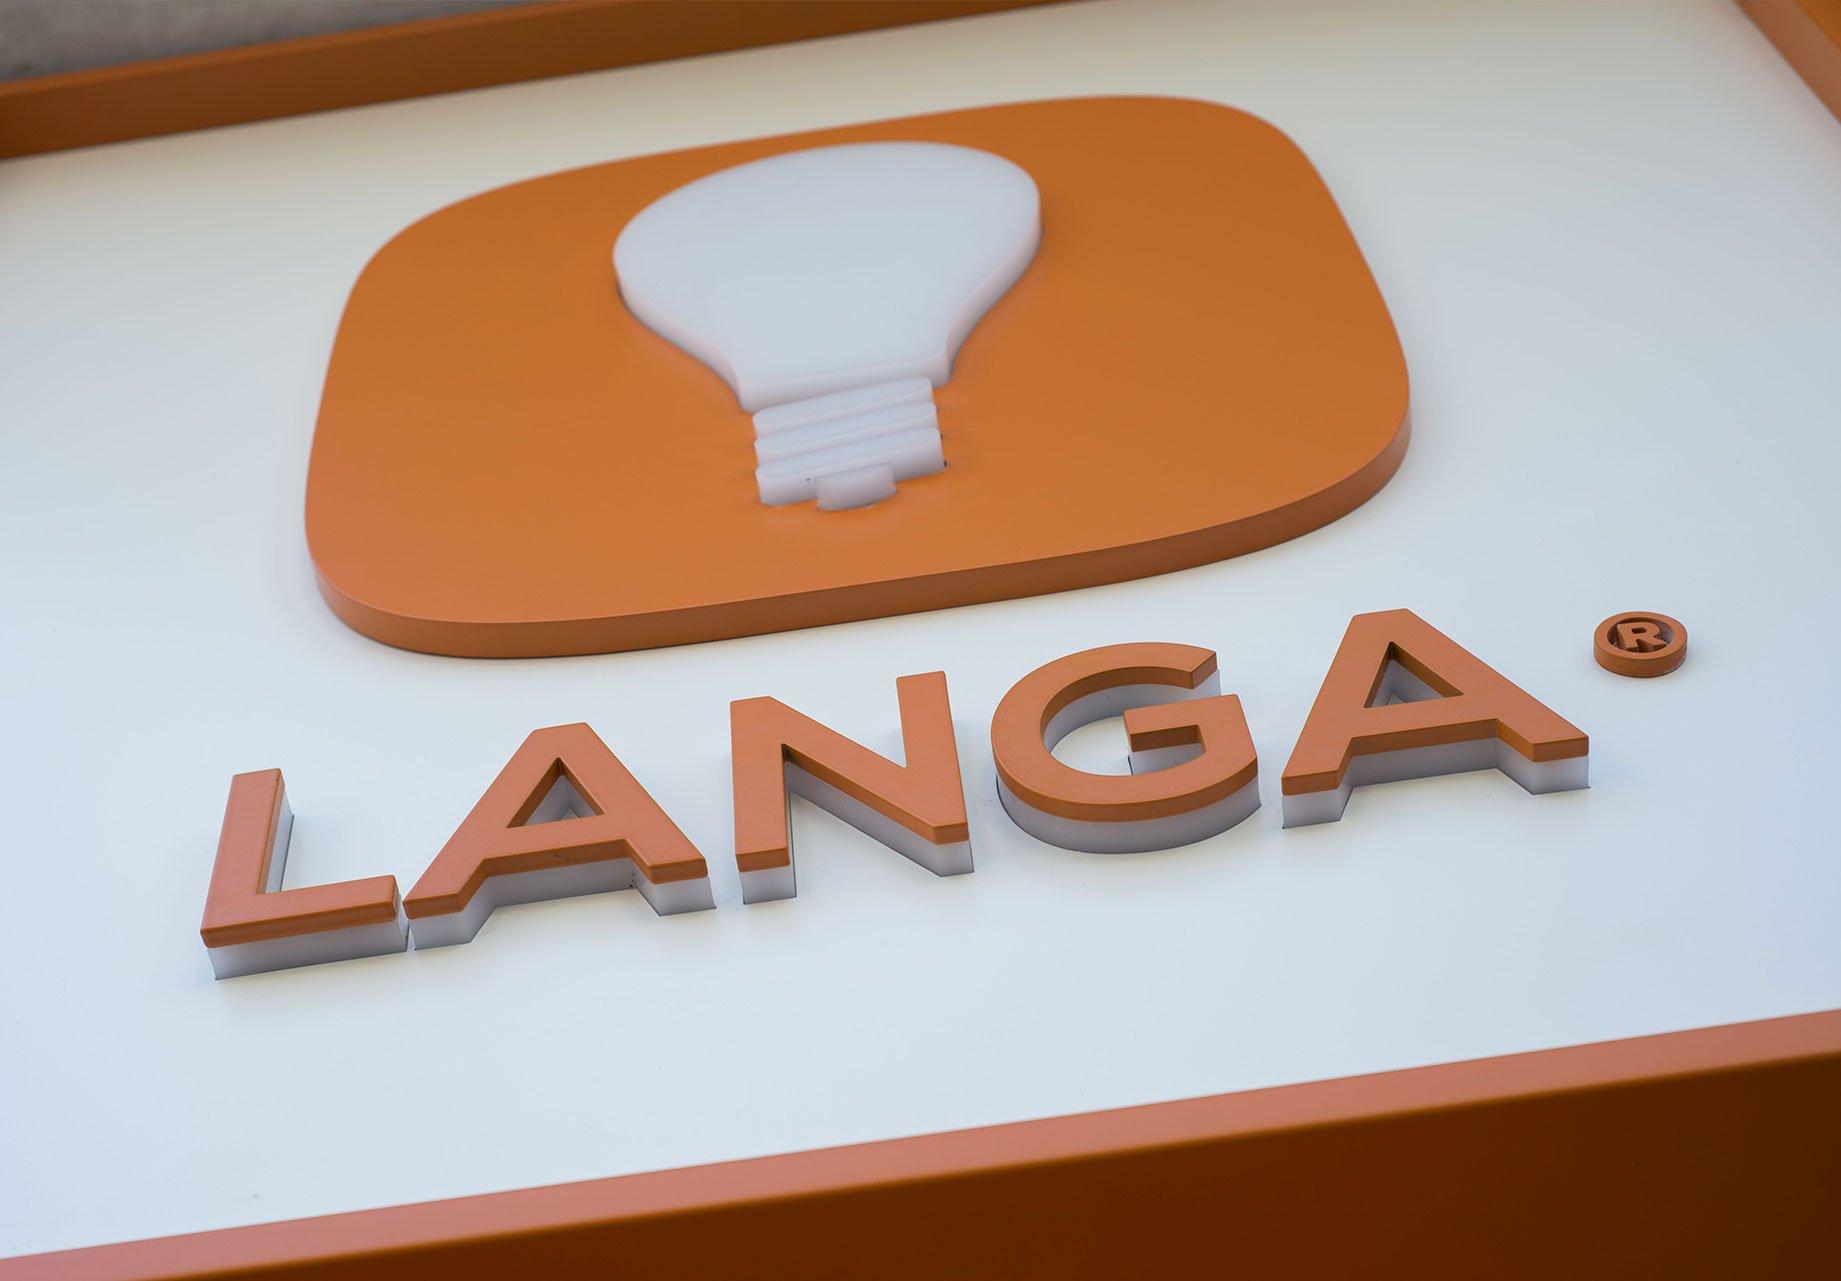 Agenzia di comunicazione LANGA